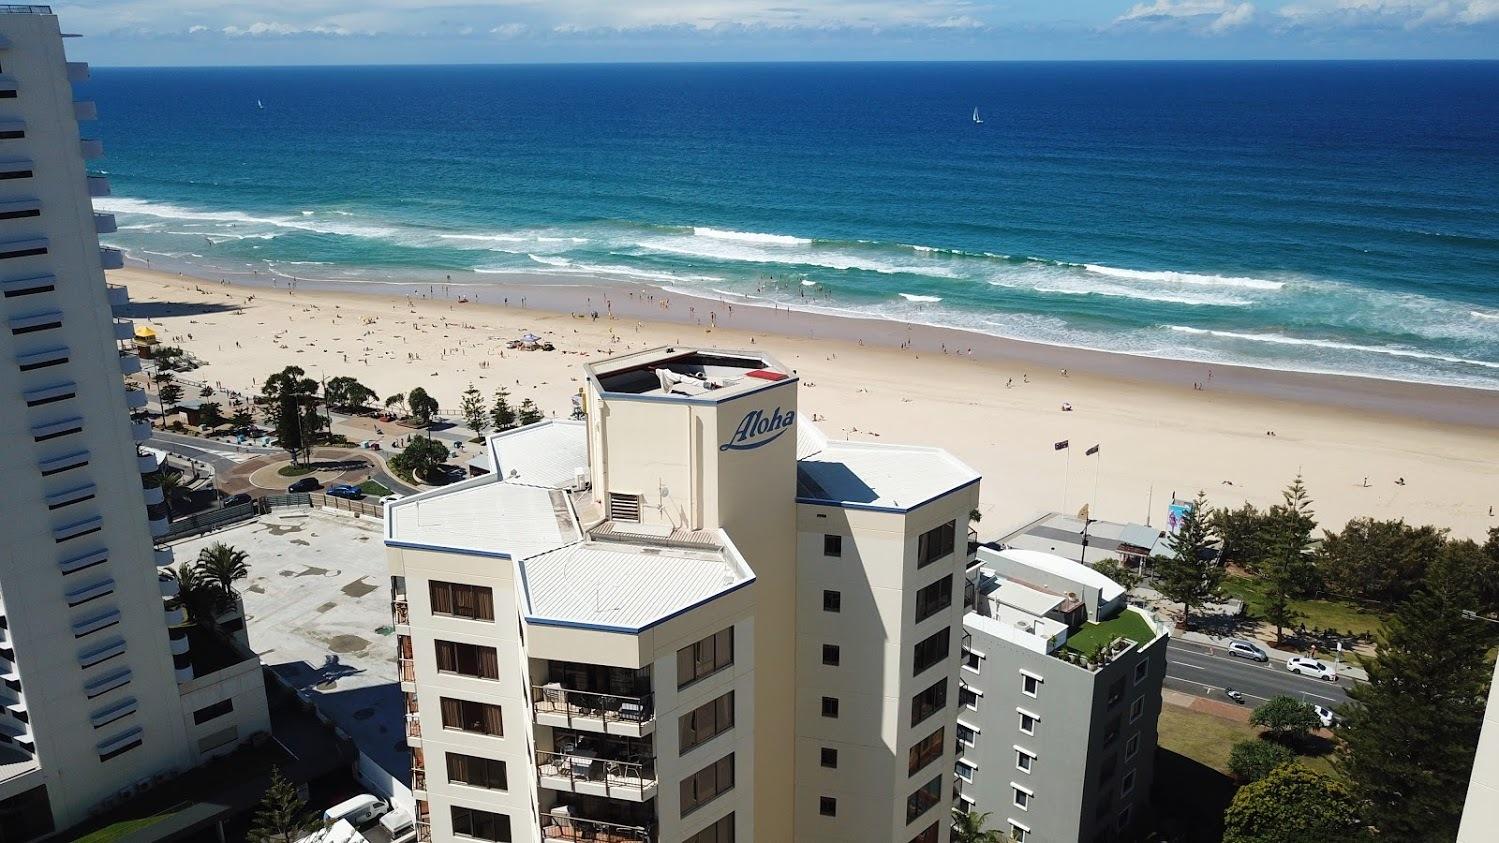 Surfholidays Com Erika S Oceanview Holiday Apartments Gold Coast